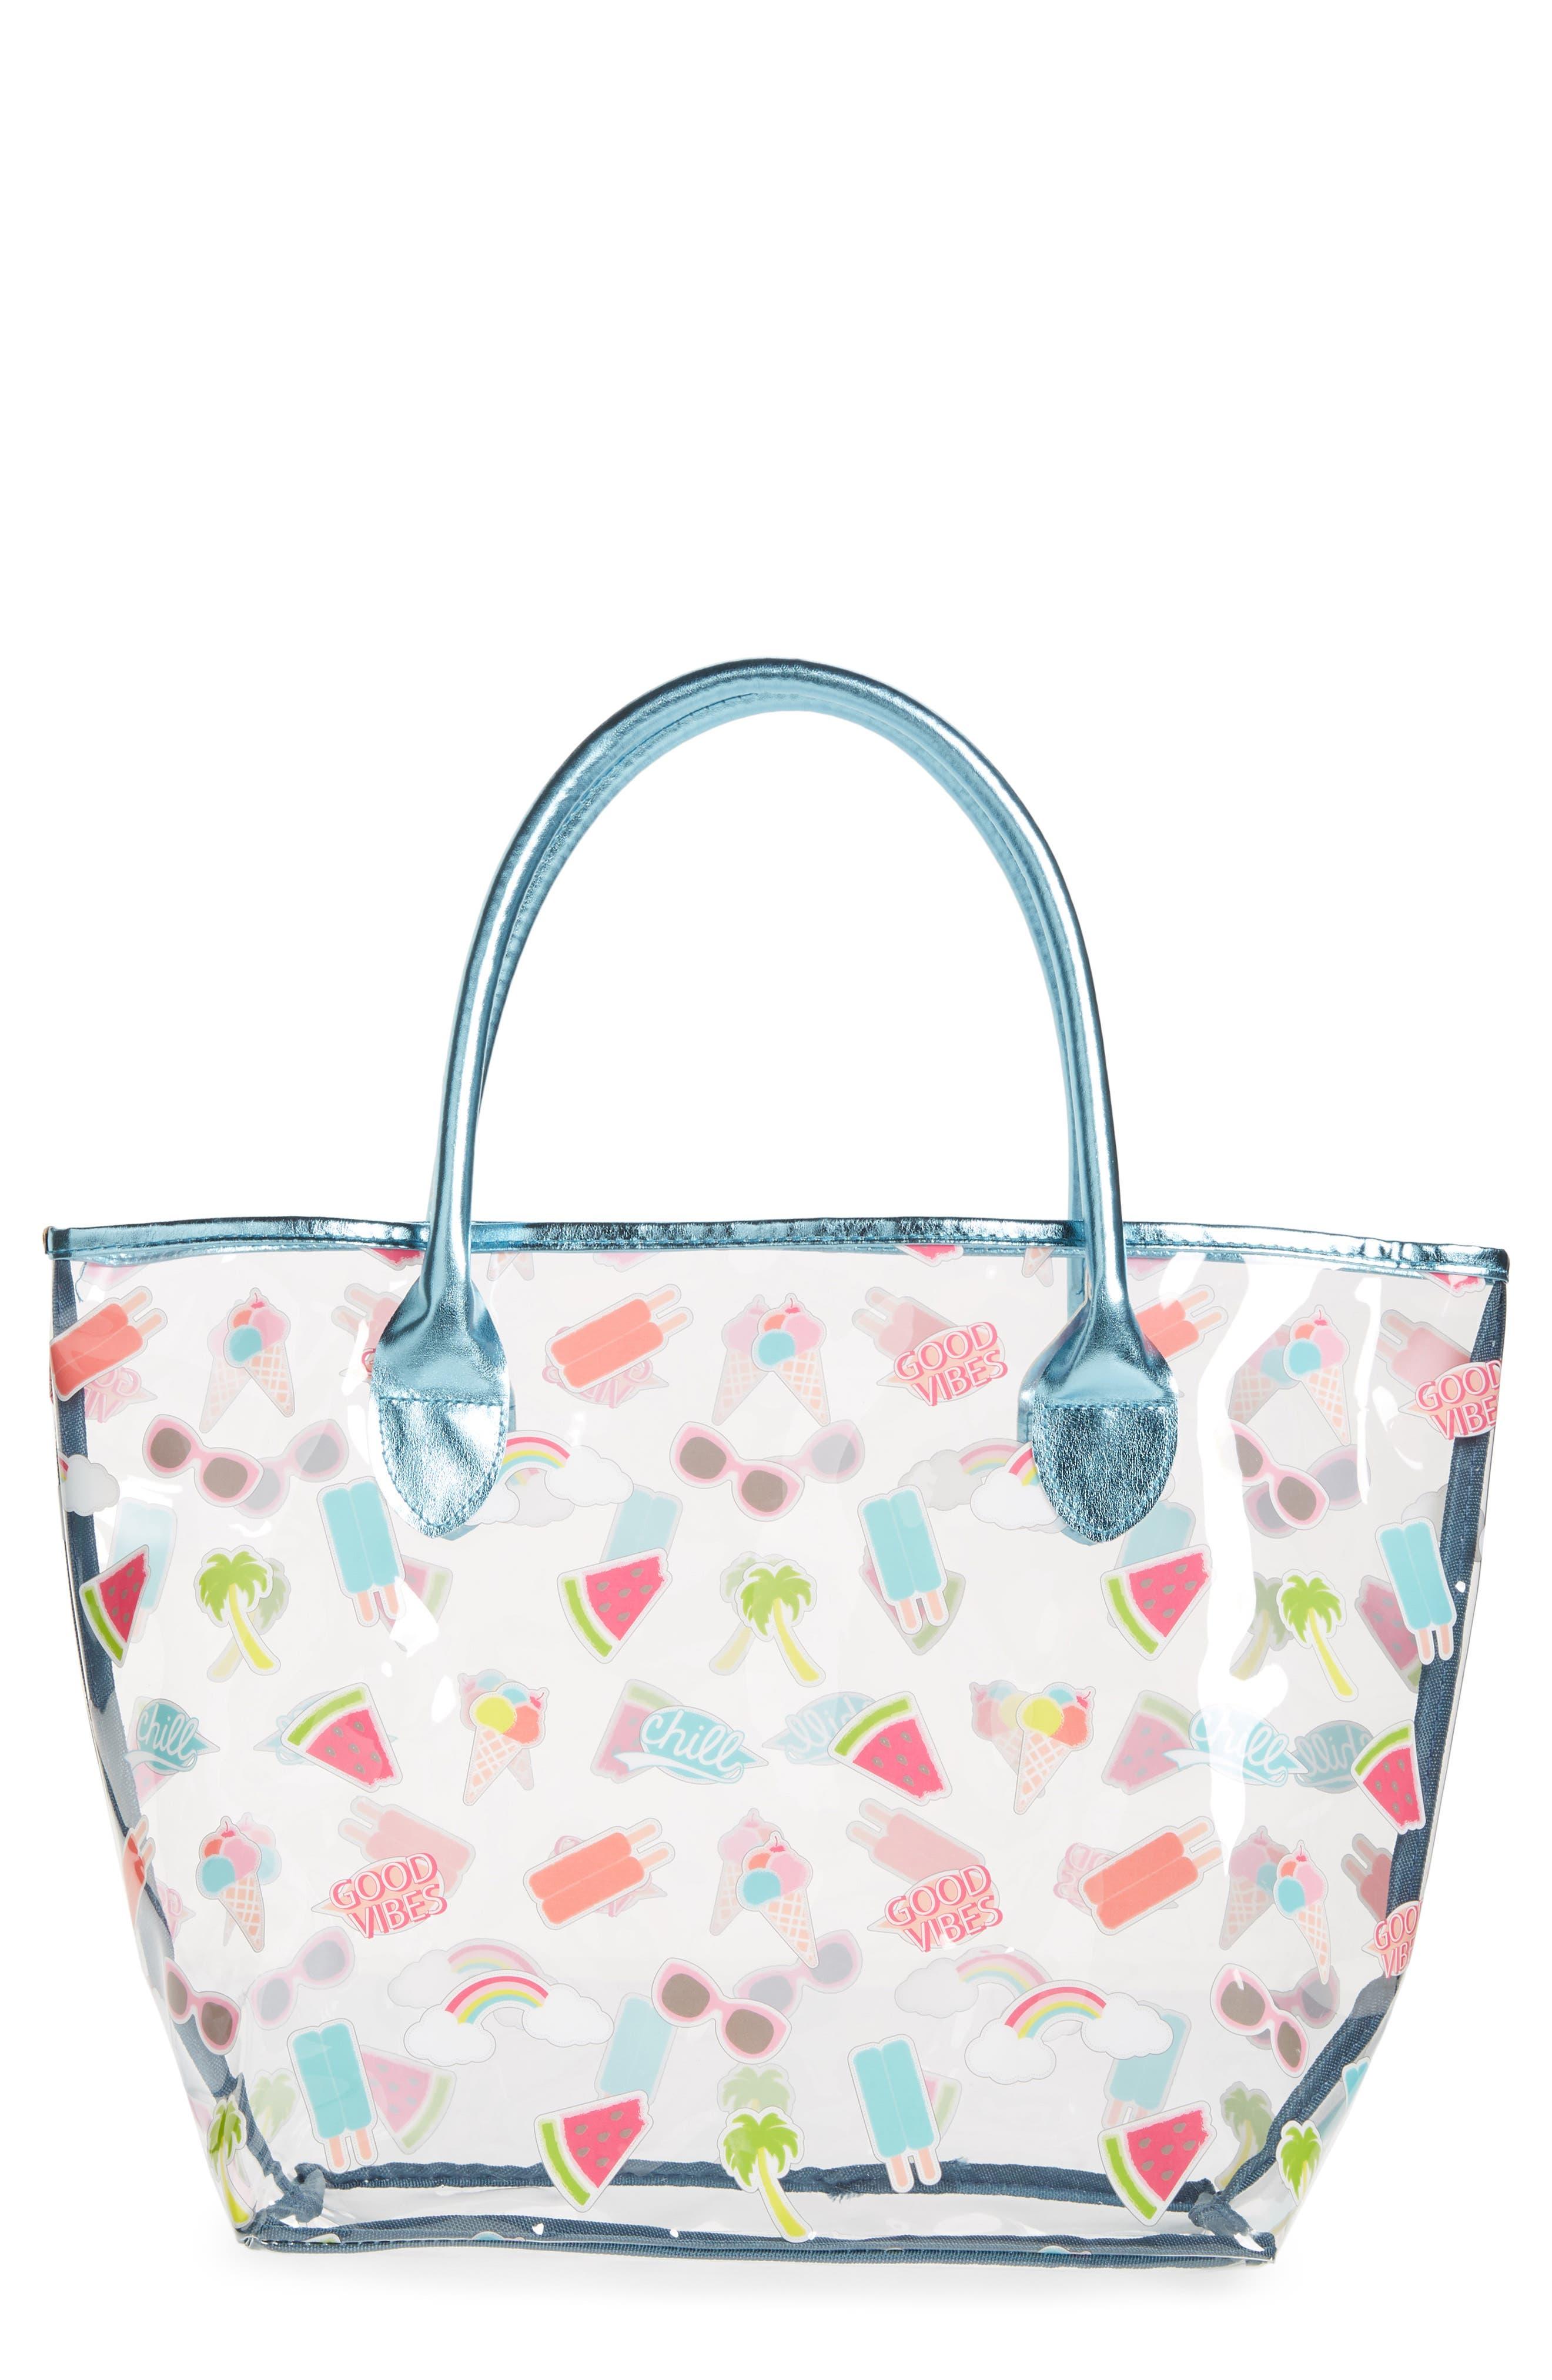 All Girls' Accessories: Handbags, Jewelry